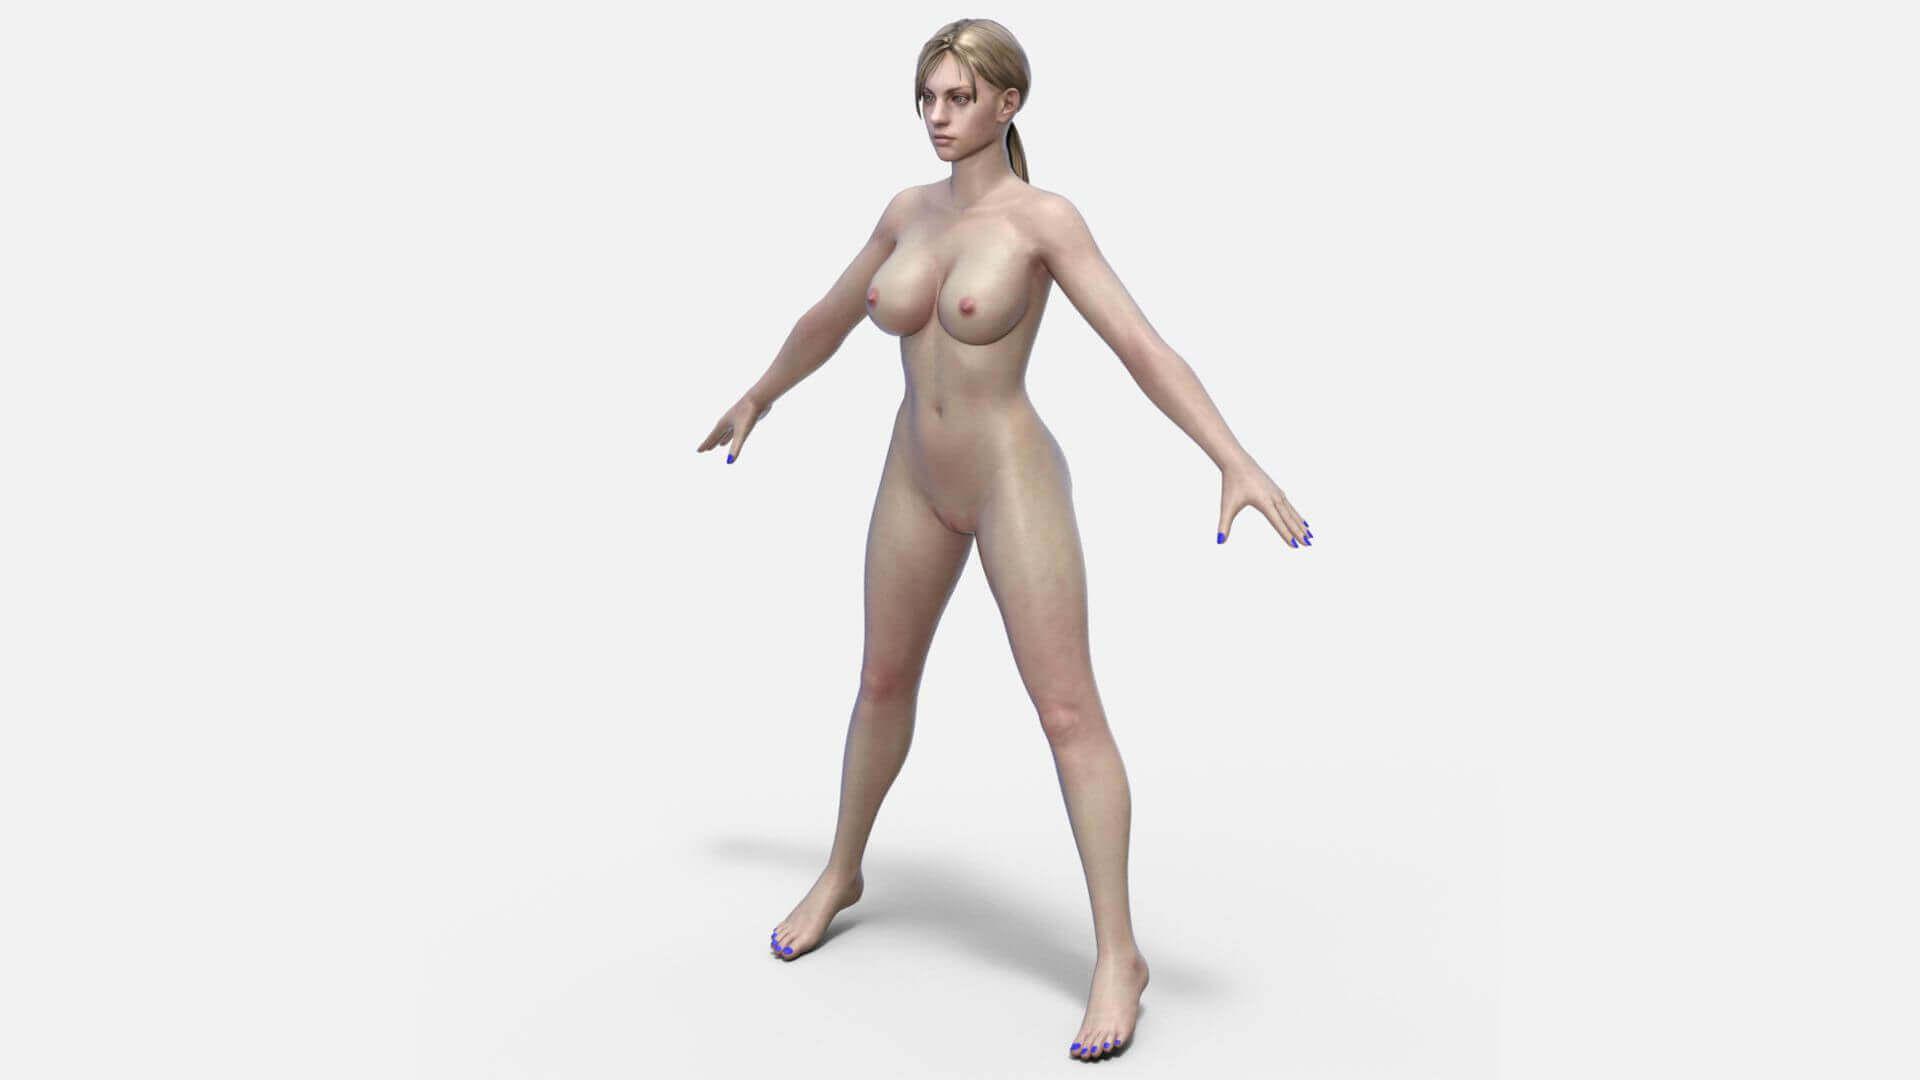 Nerd goth girls nude pics